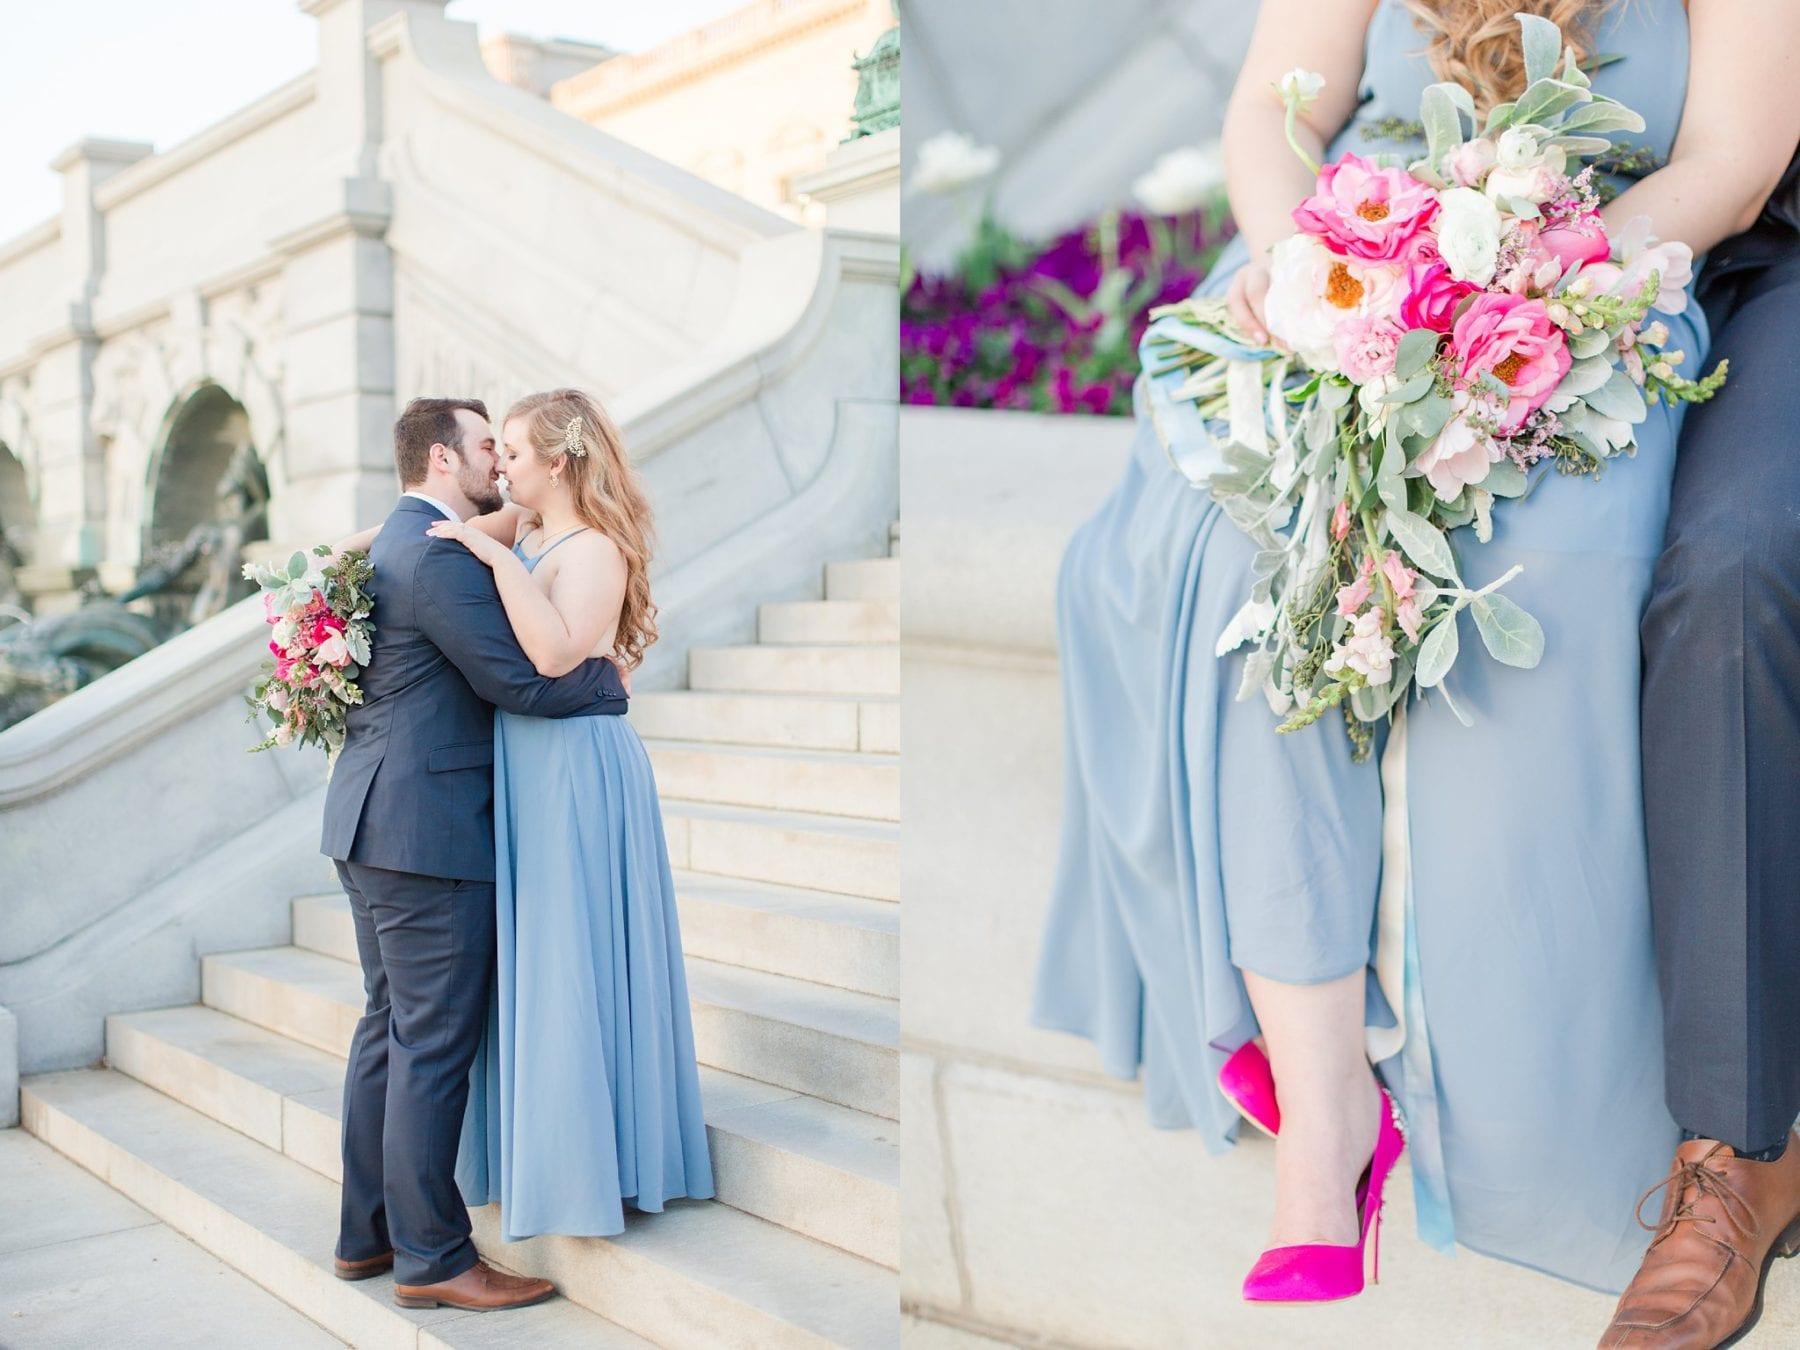 Capitol Hill Engagement Photos Kelly & Zach Washington DC Wedding Photographer Megan Kelsey Photography-287.jpg